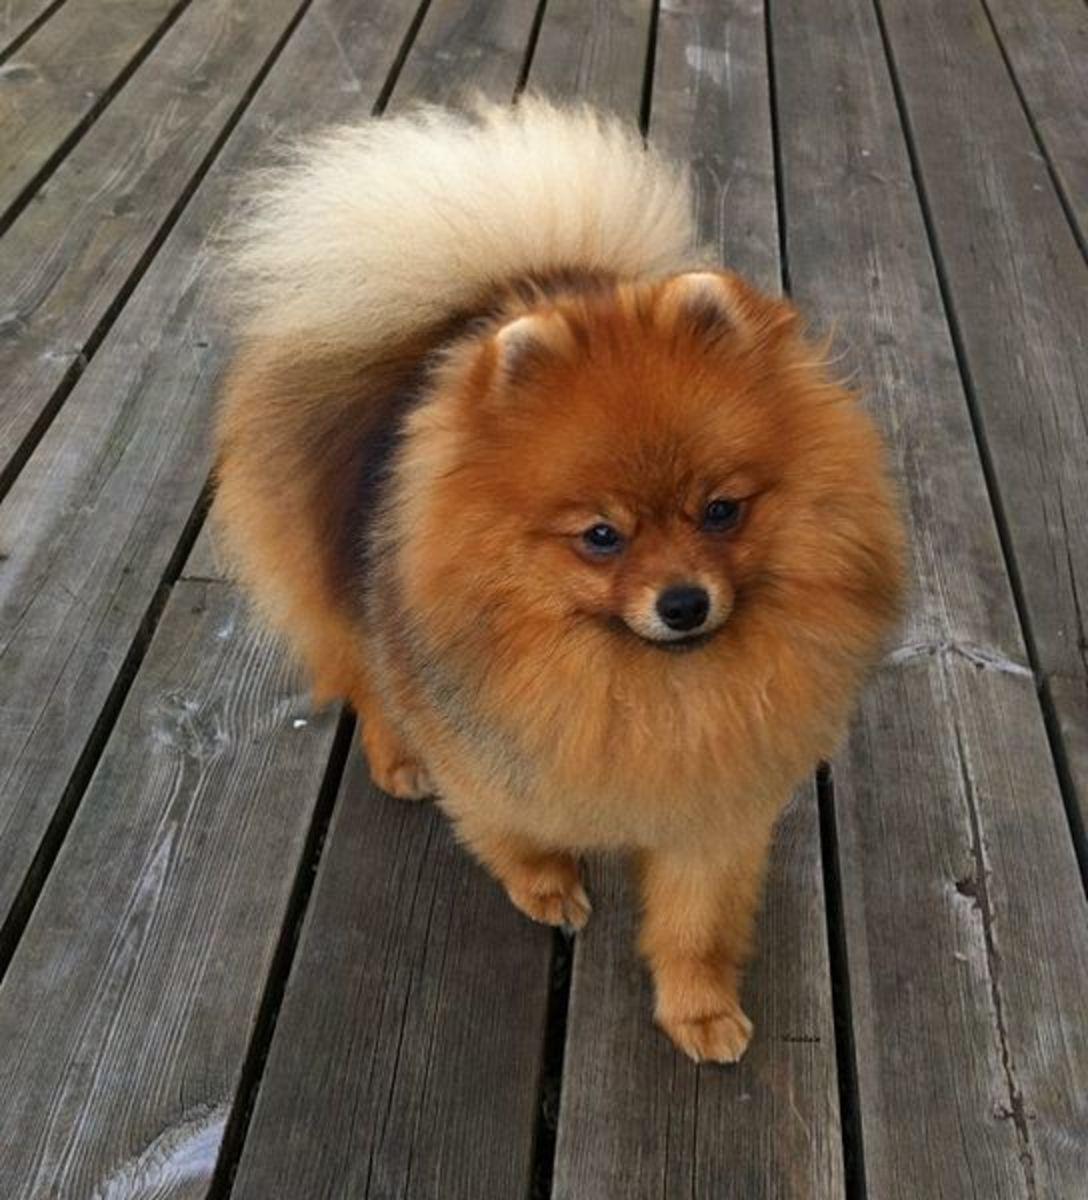 Pomeranian coats require daily brushing.